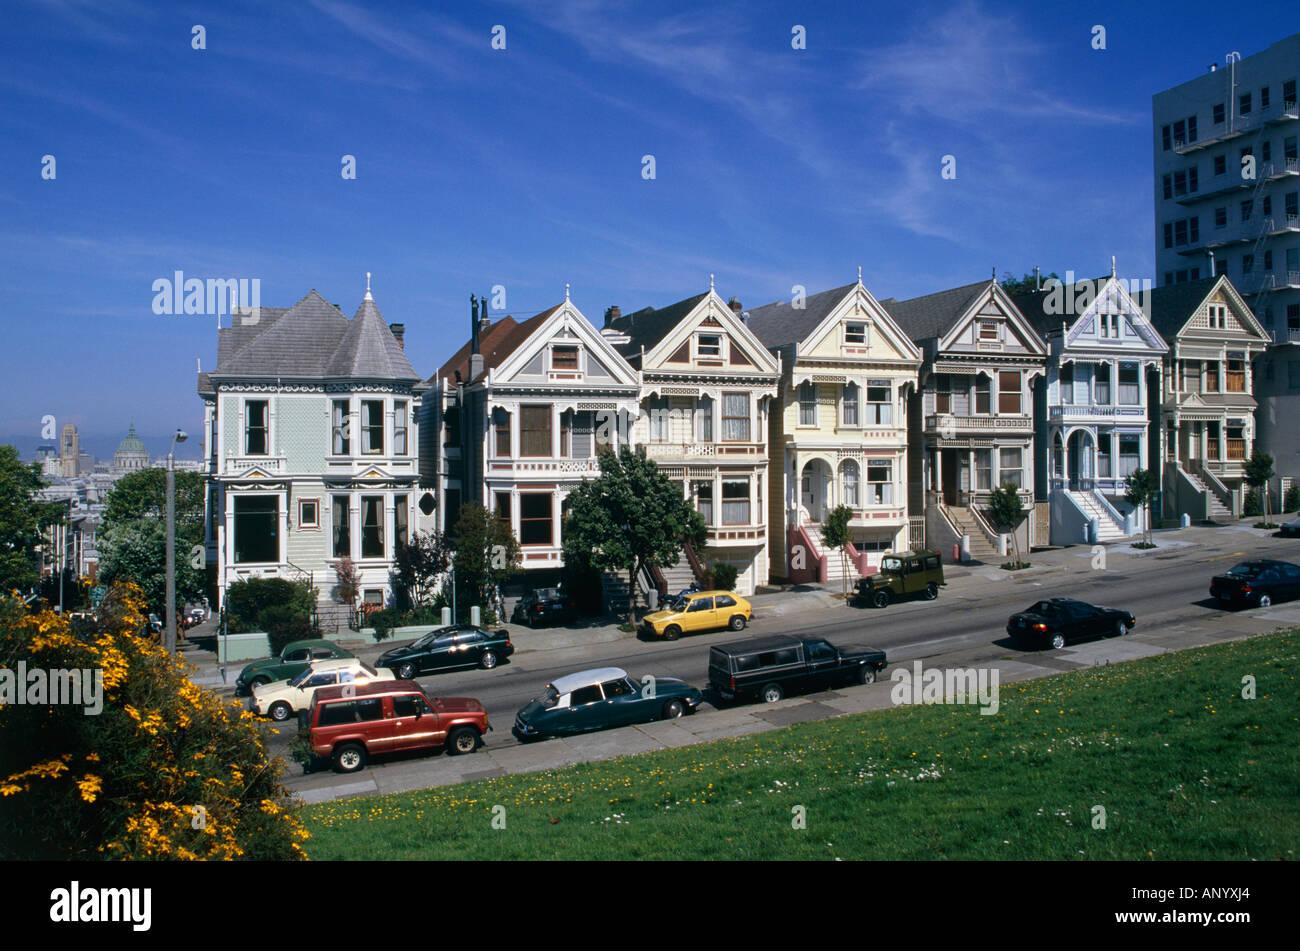 Best Etat De San Francisco Images - Joshkrajcik.us - joshkrajcik.us